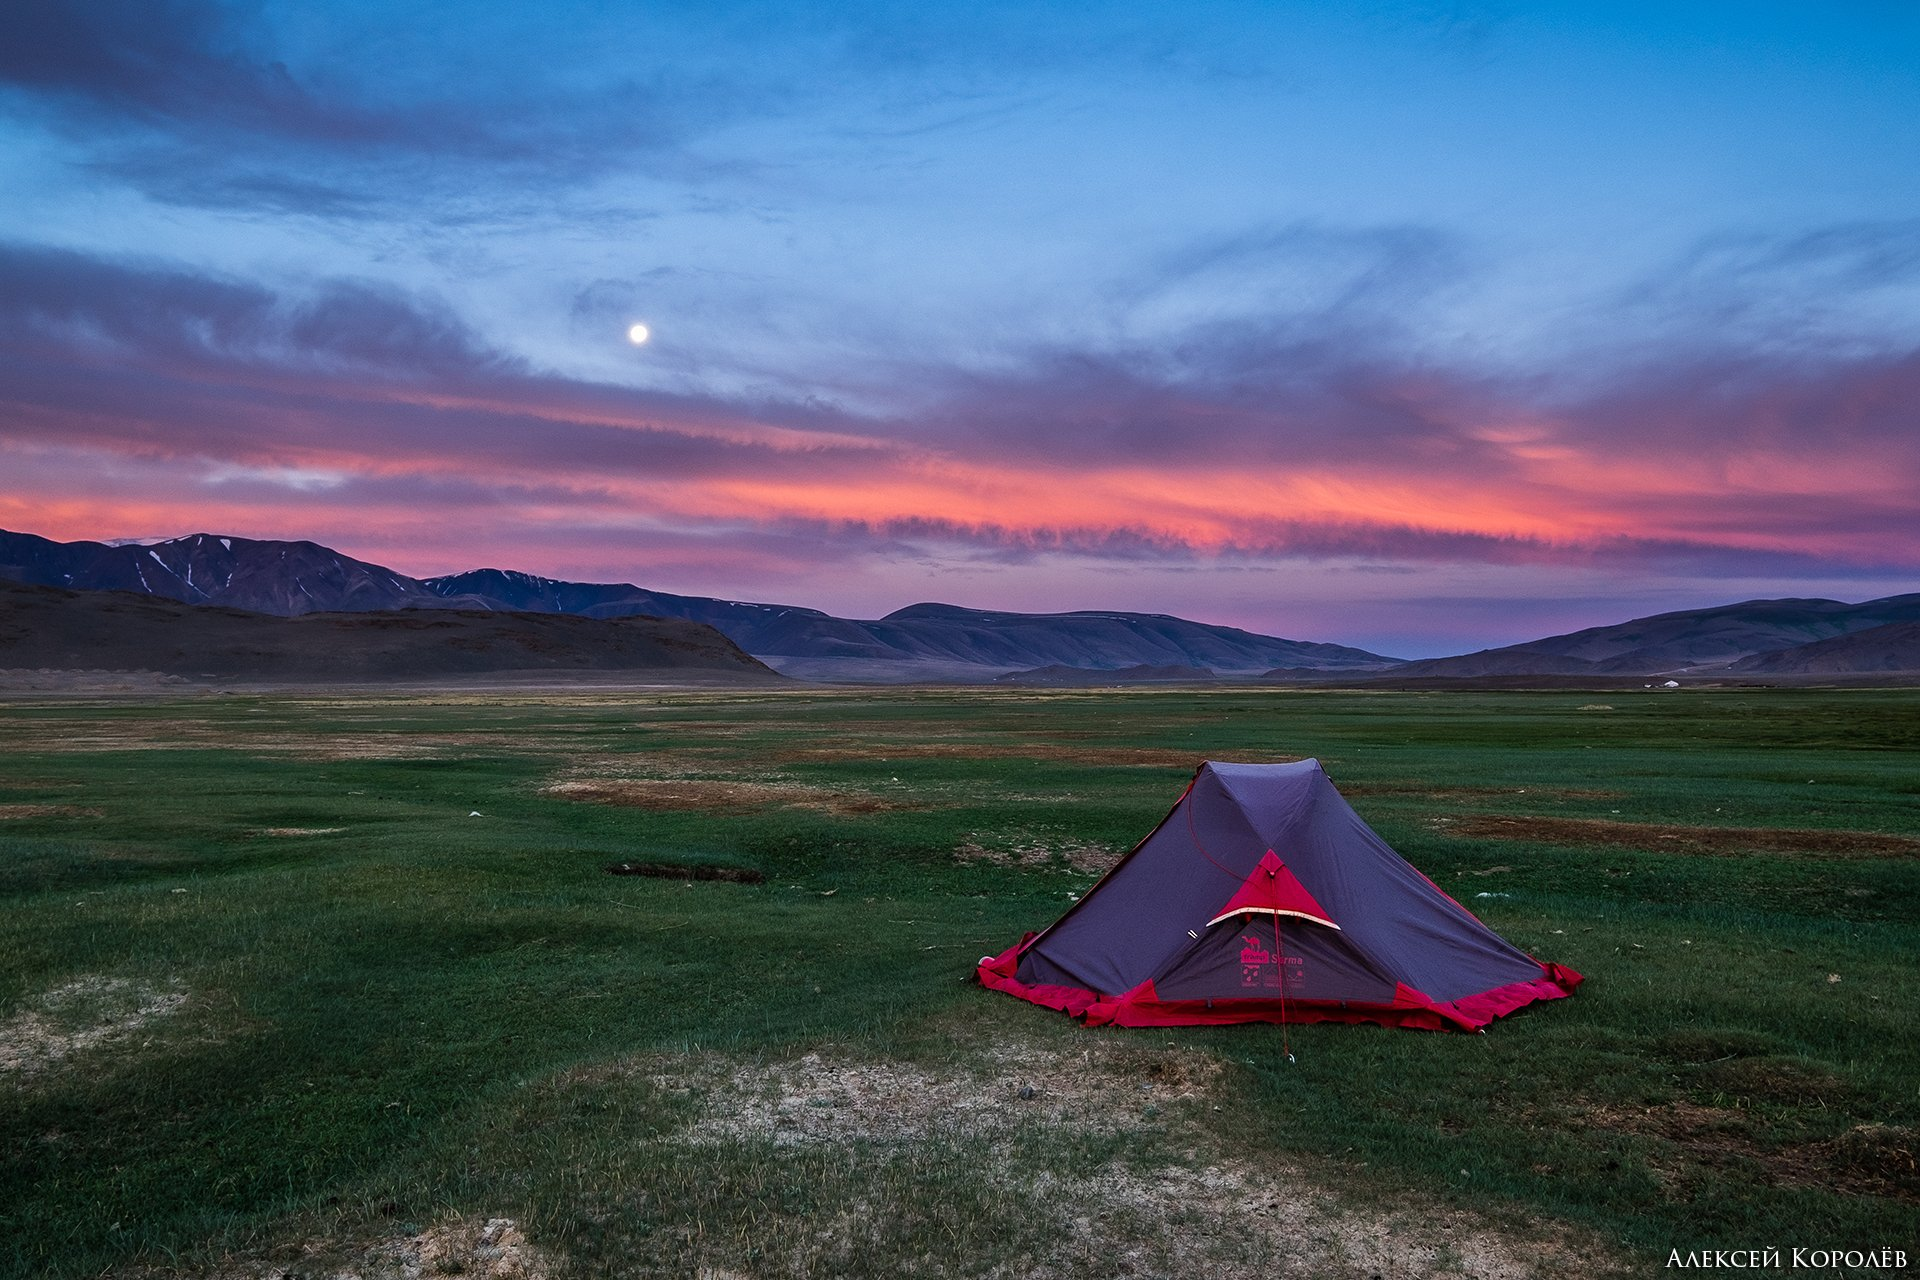 монголия, горы, алтай, рассвет, палатка, луна, природа, пейзаж, лето, mongolia, mountains, altai, dawn, tent, moon, nature, landscape, summer, Алексей Королёв